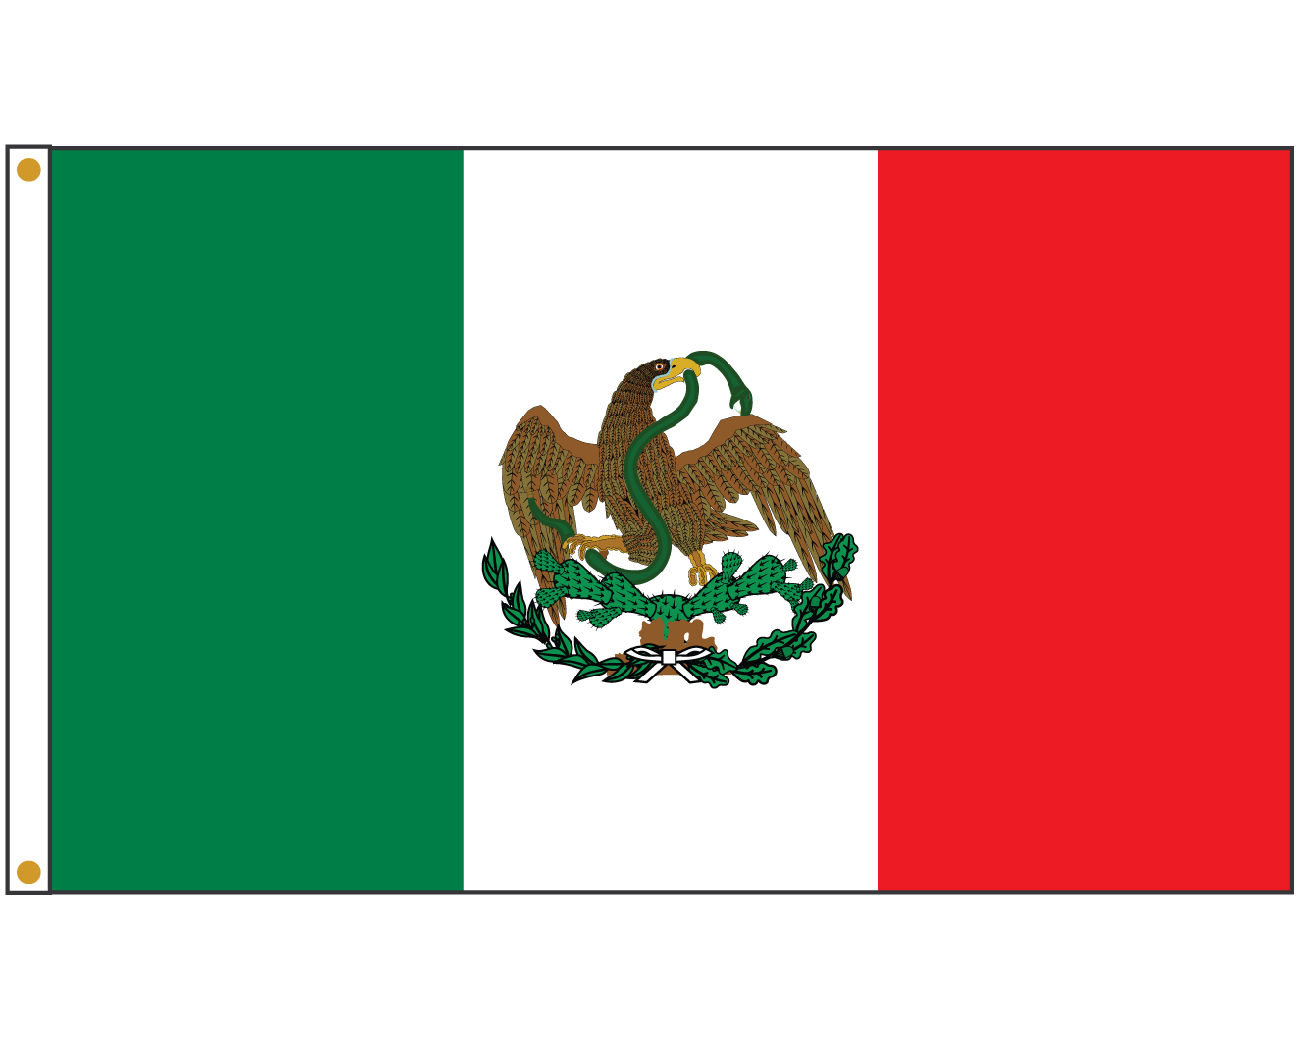 mexico flag 1824 1836 3x5 mexico flags north america flags